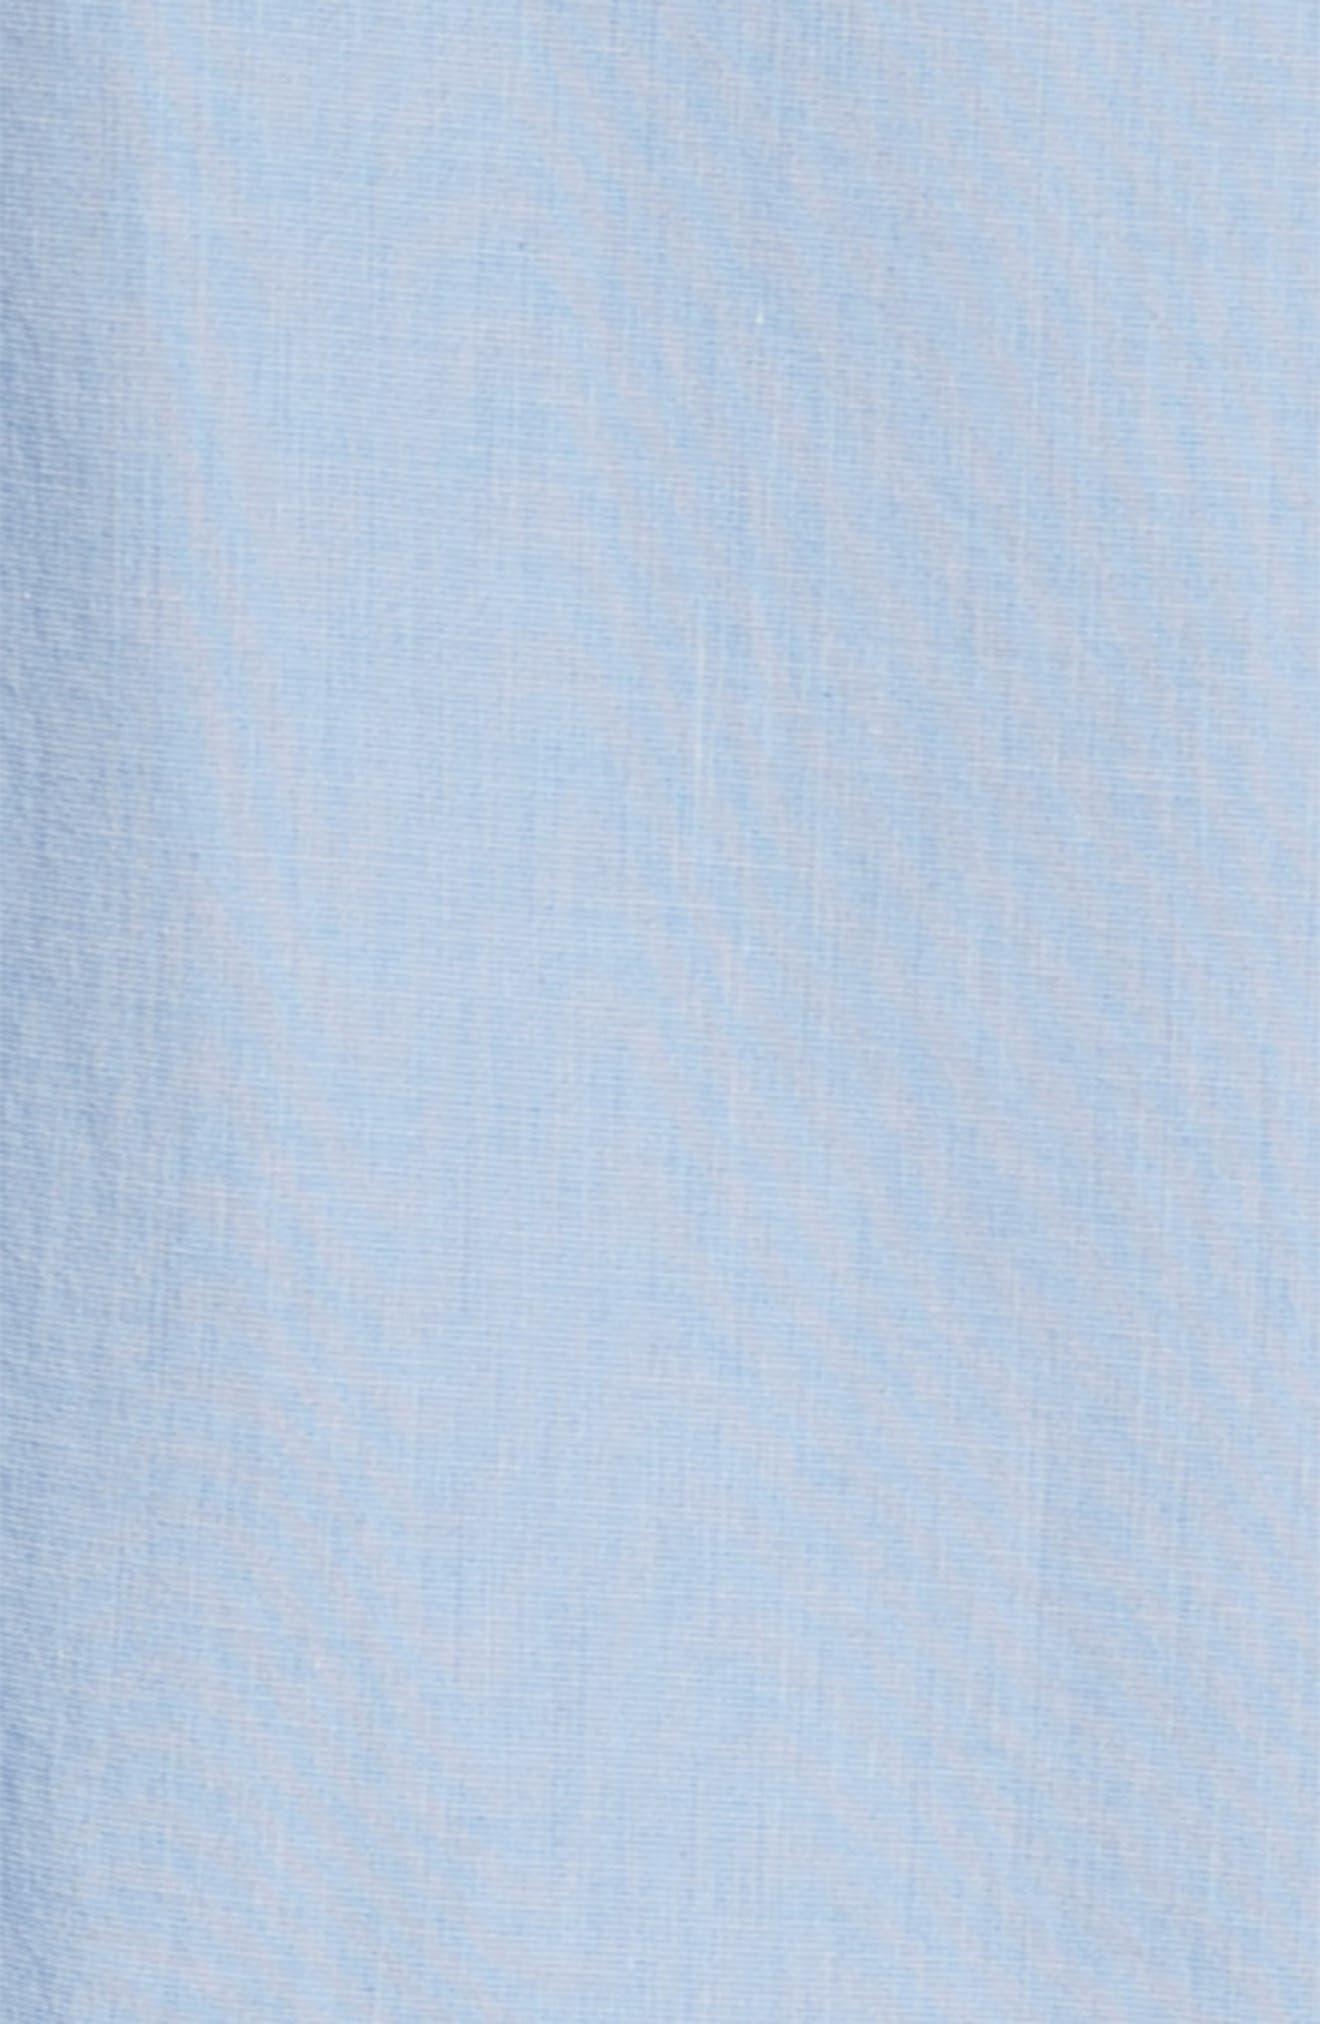 Ruffle Shirtdress,                             Alternate thumbnail 3, color,                             Blue Chambray Grid